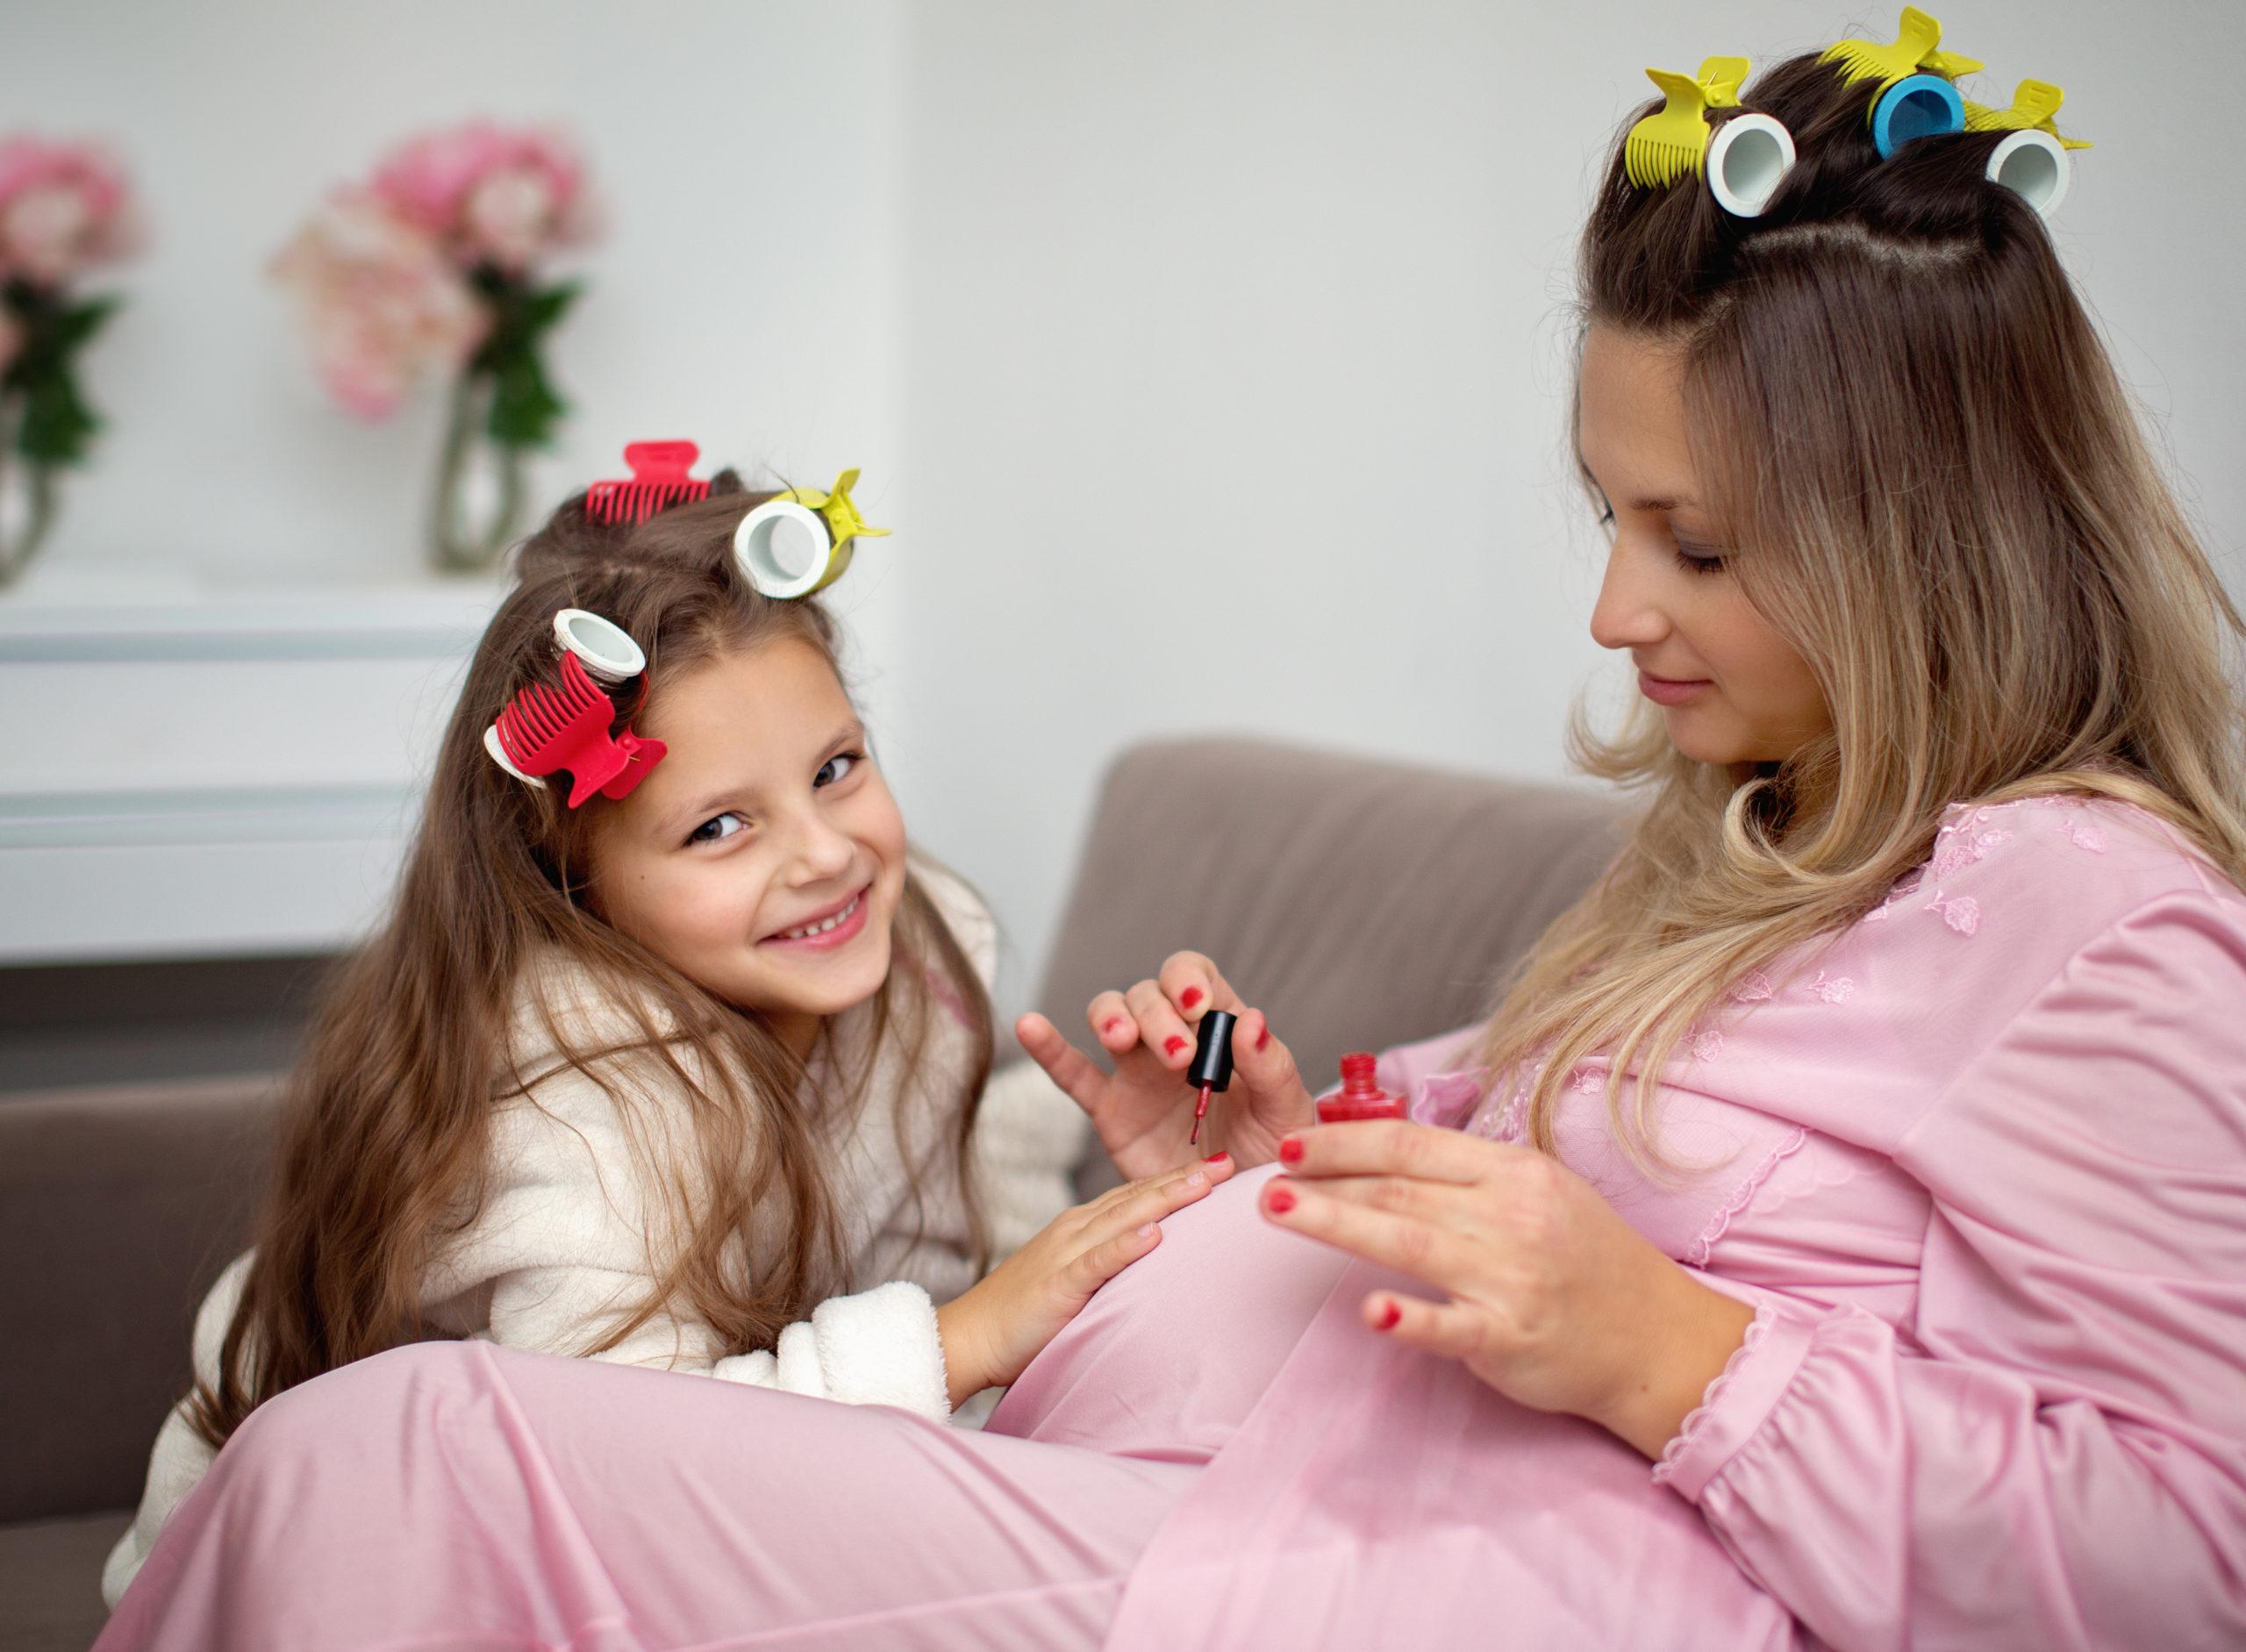 mani-pedi during pregnancy